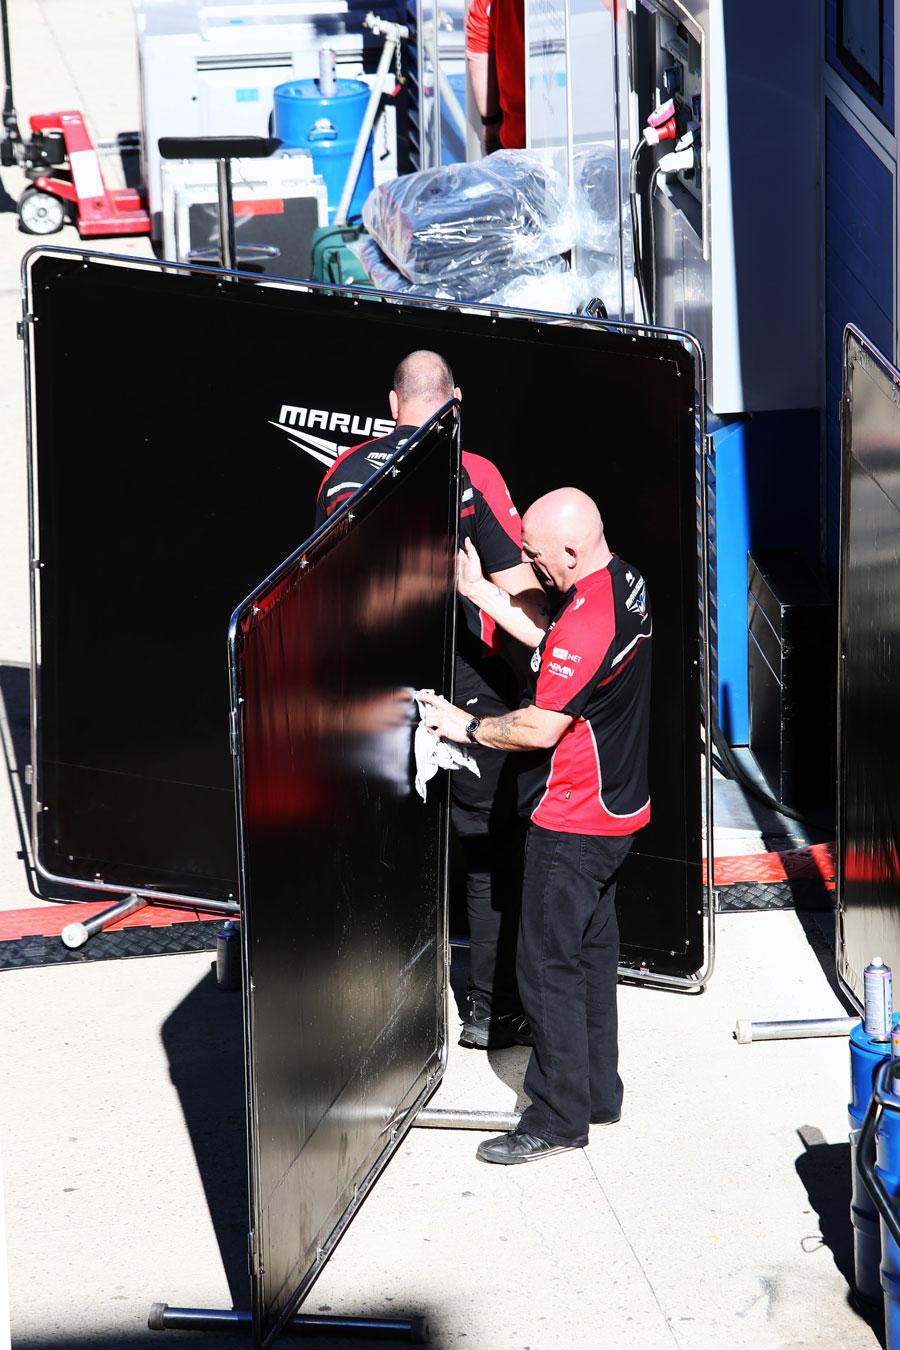 Marussia mechanics clean screens in the paddock